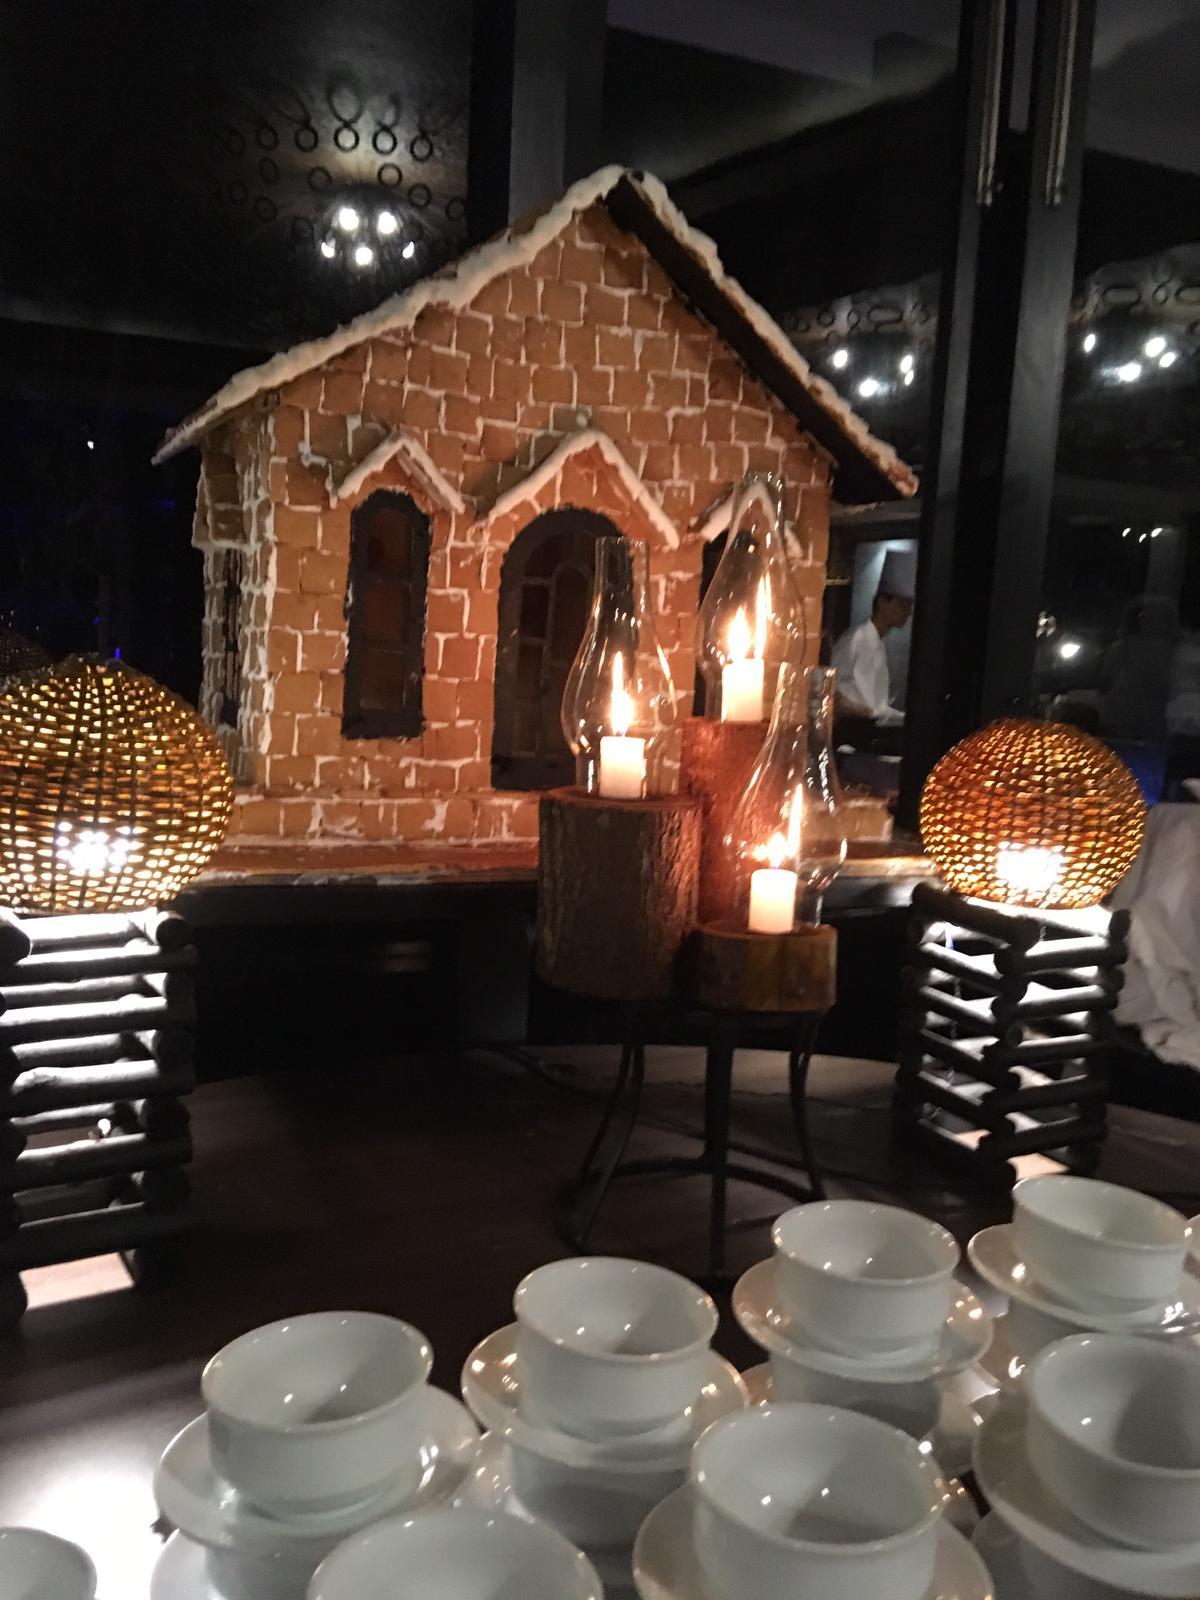 invite-to-paradise-sri-lanka-family-holiday-specialists-customer-feedback-pickering-gingerbread-house.jpg